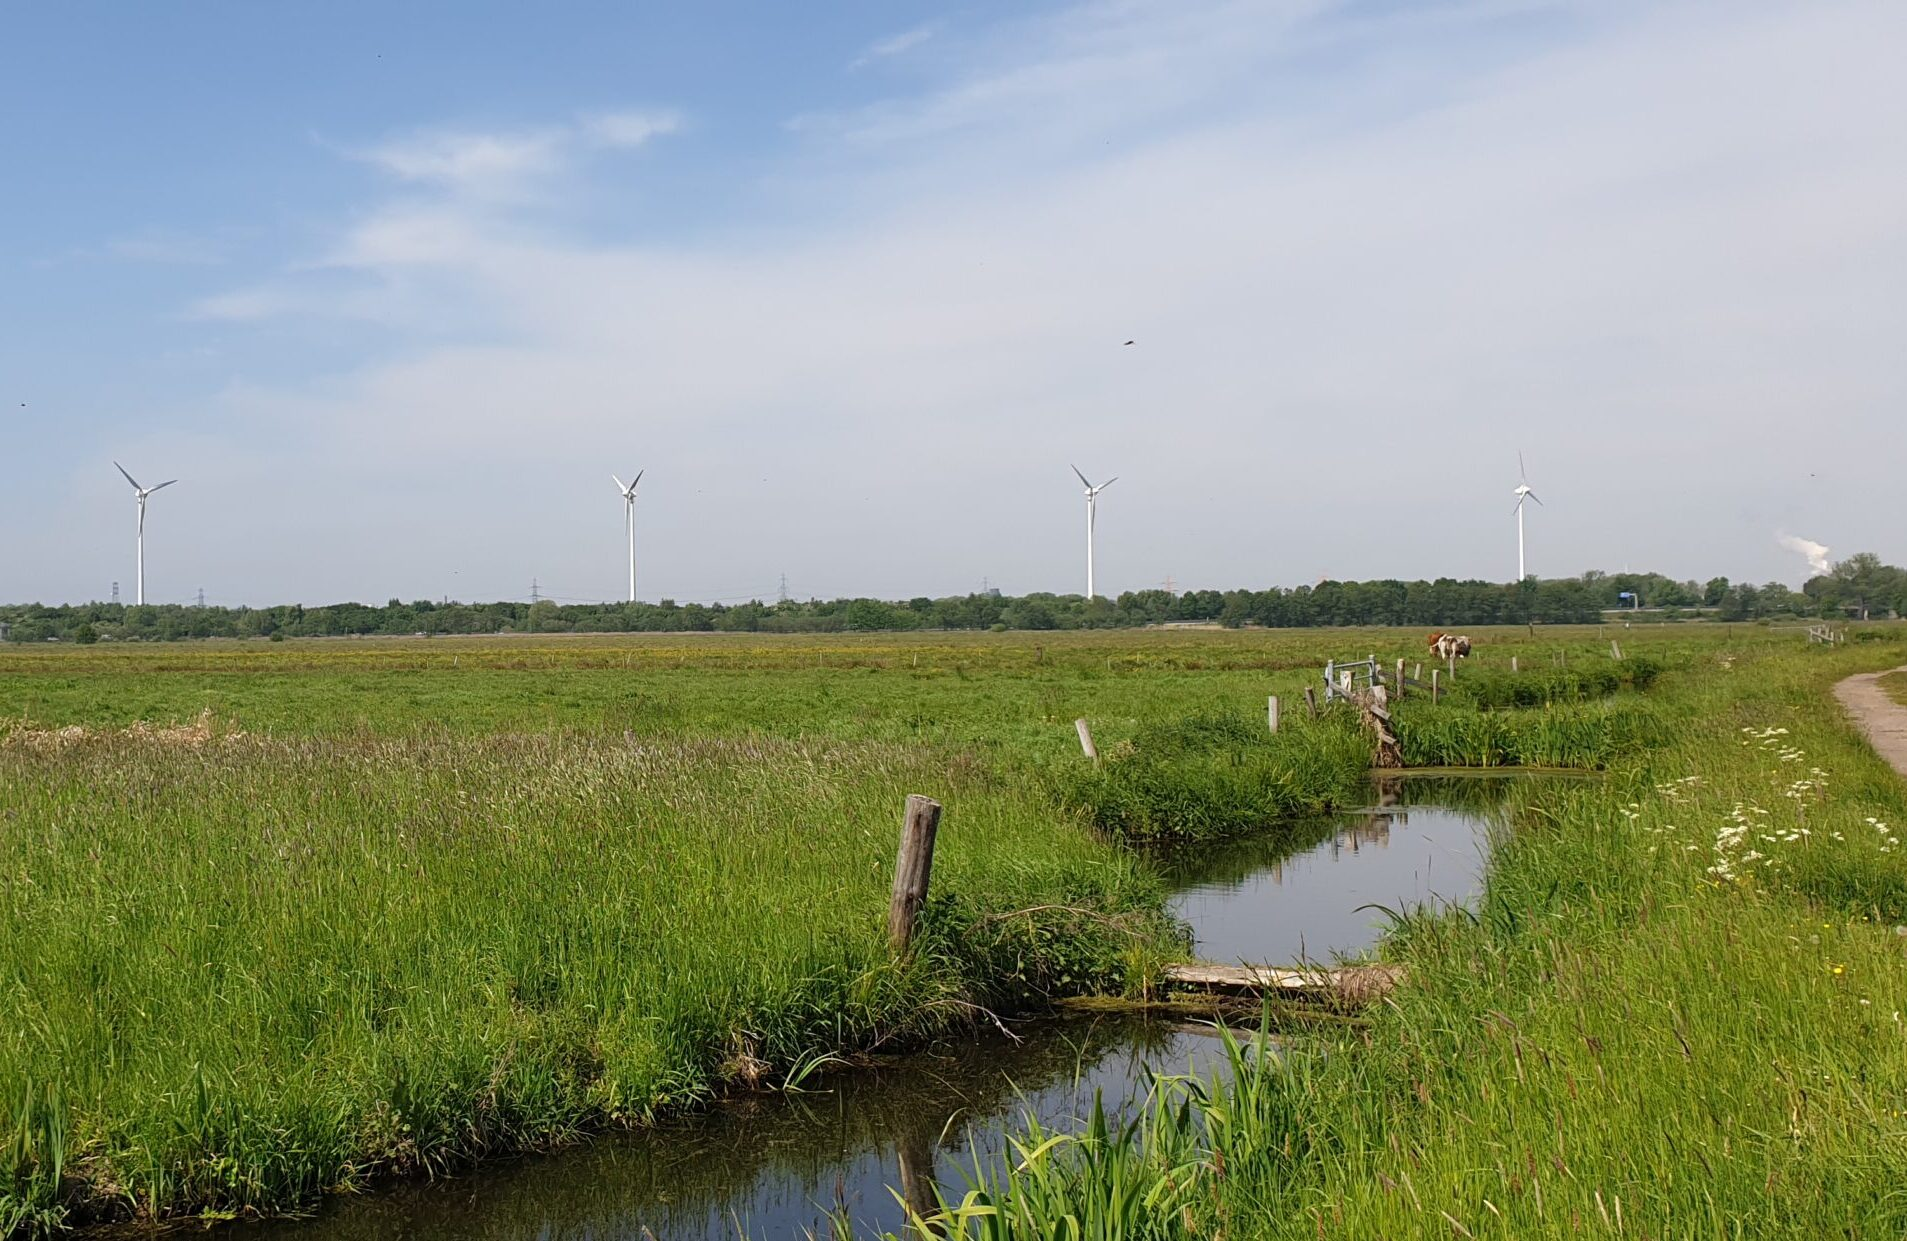 Naturschutzgebiet Neuländer Moorwiesen